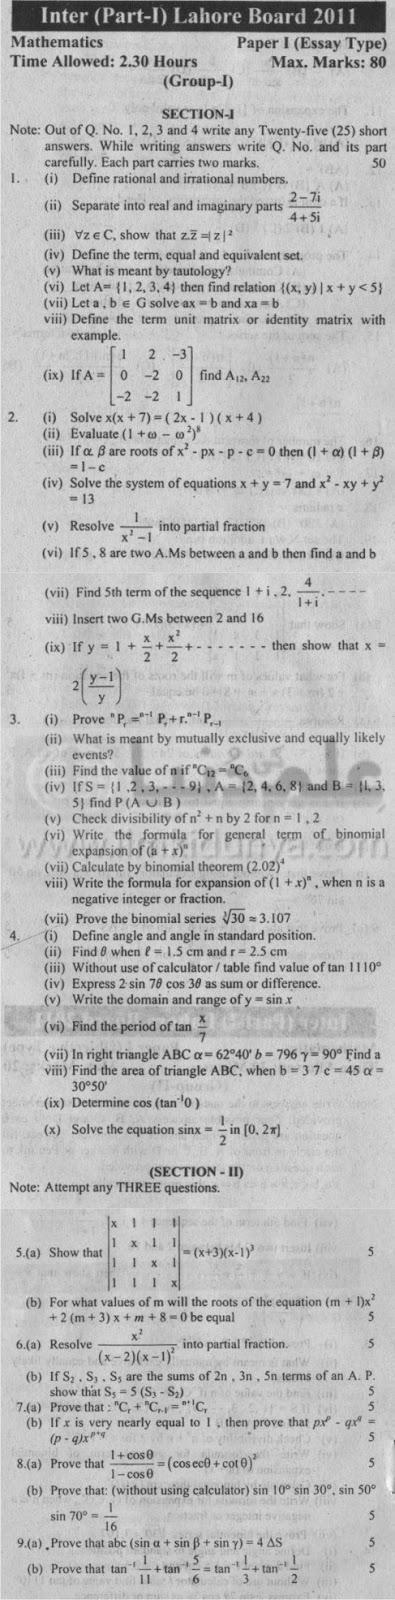 Inter Part I Mathematics Subjective Paper I Group I Lahore Board 2011